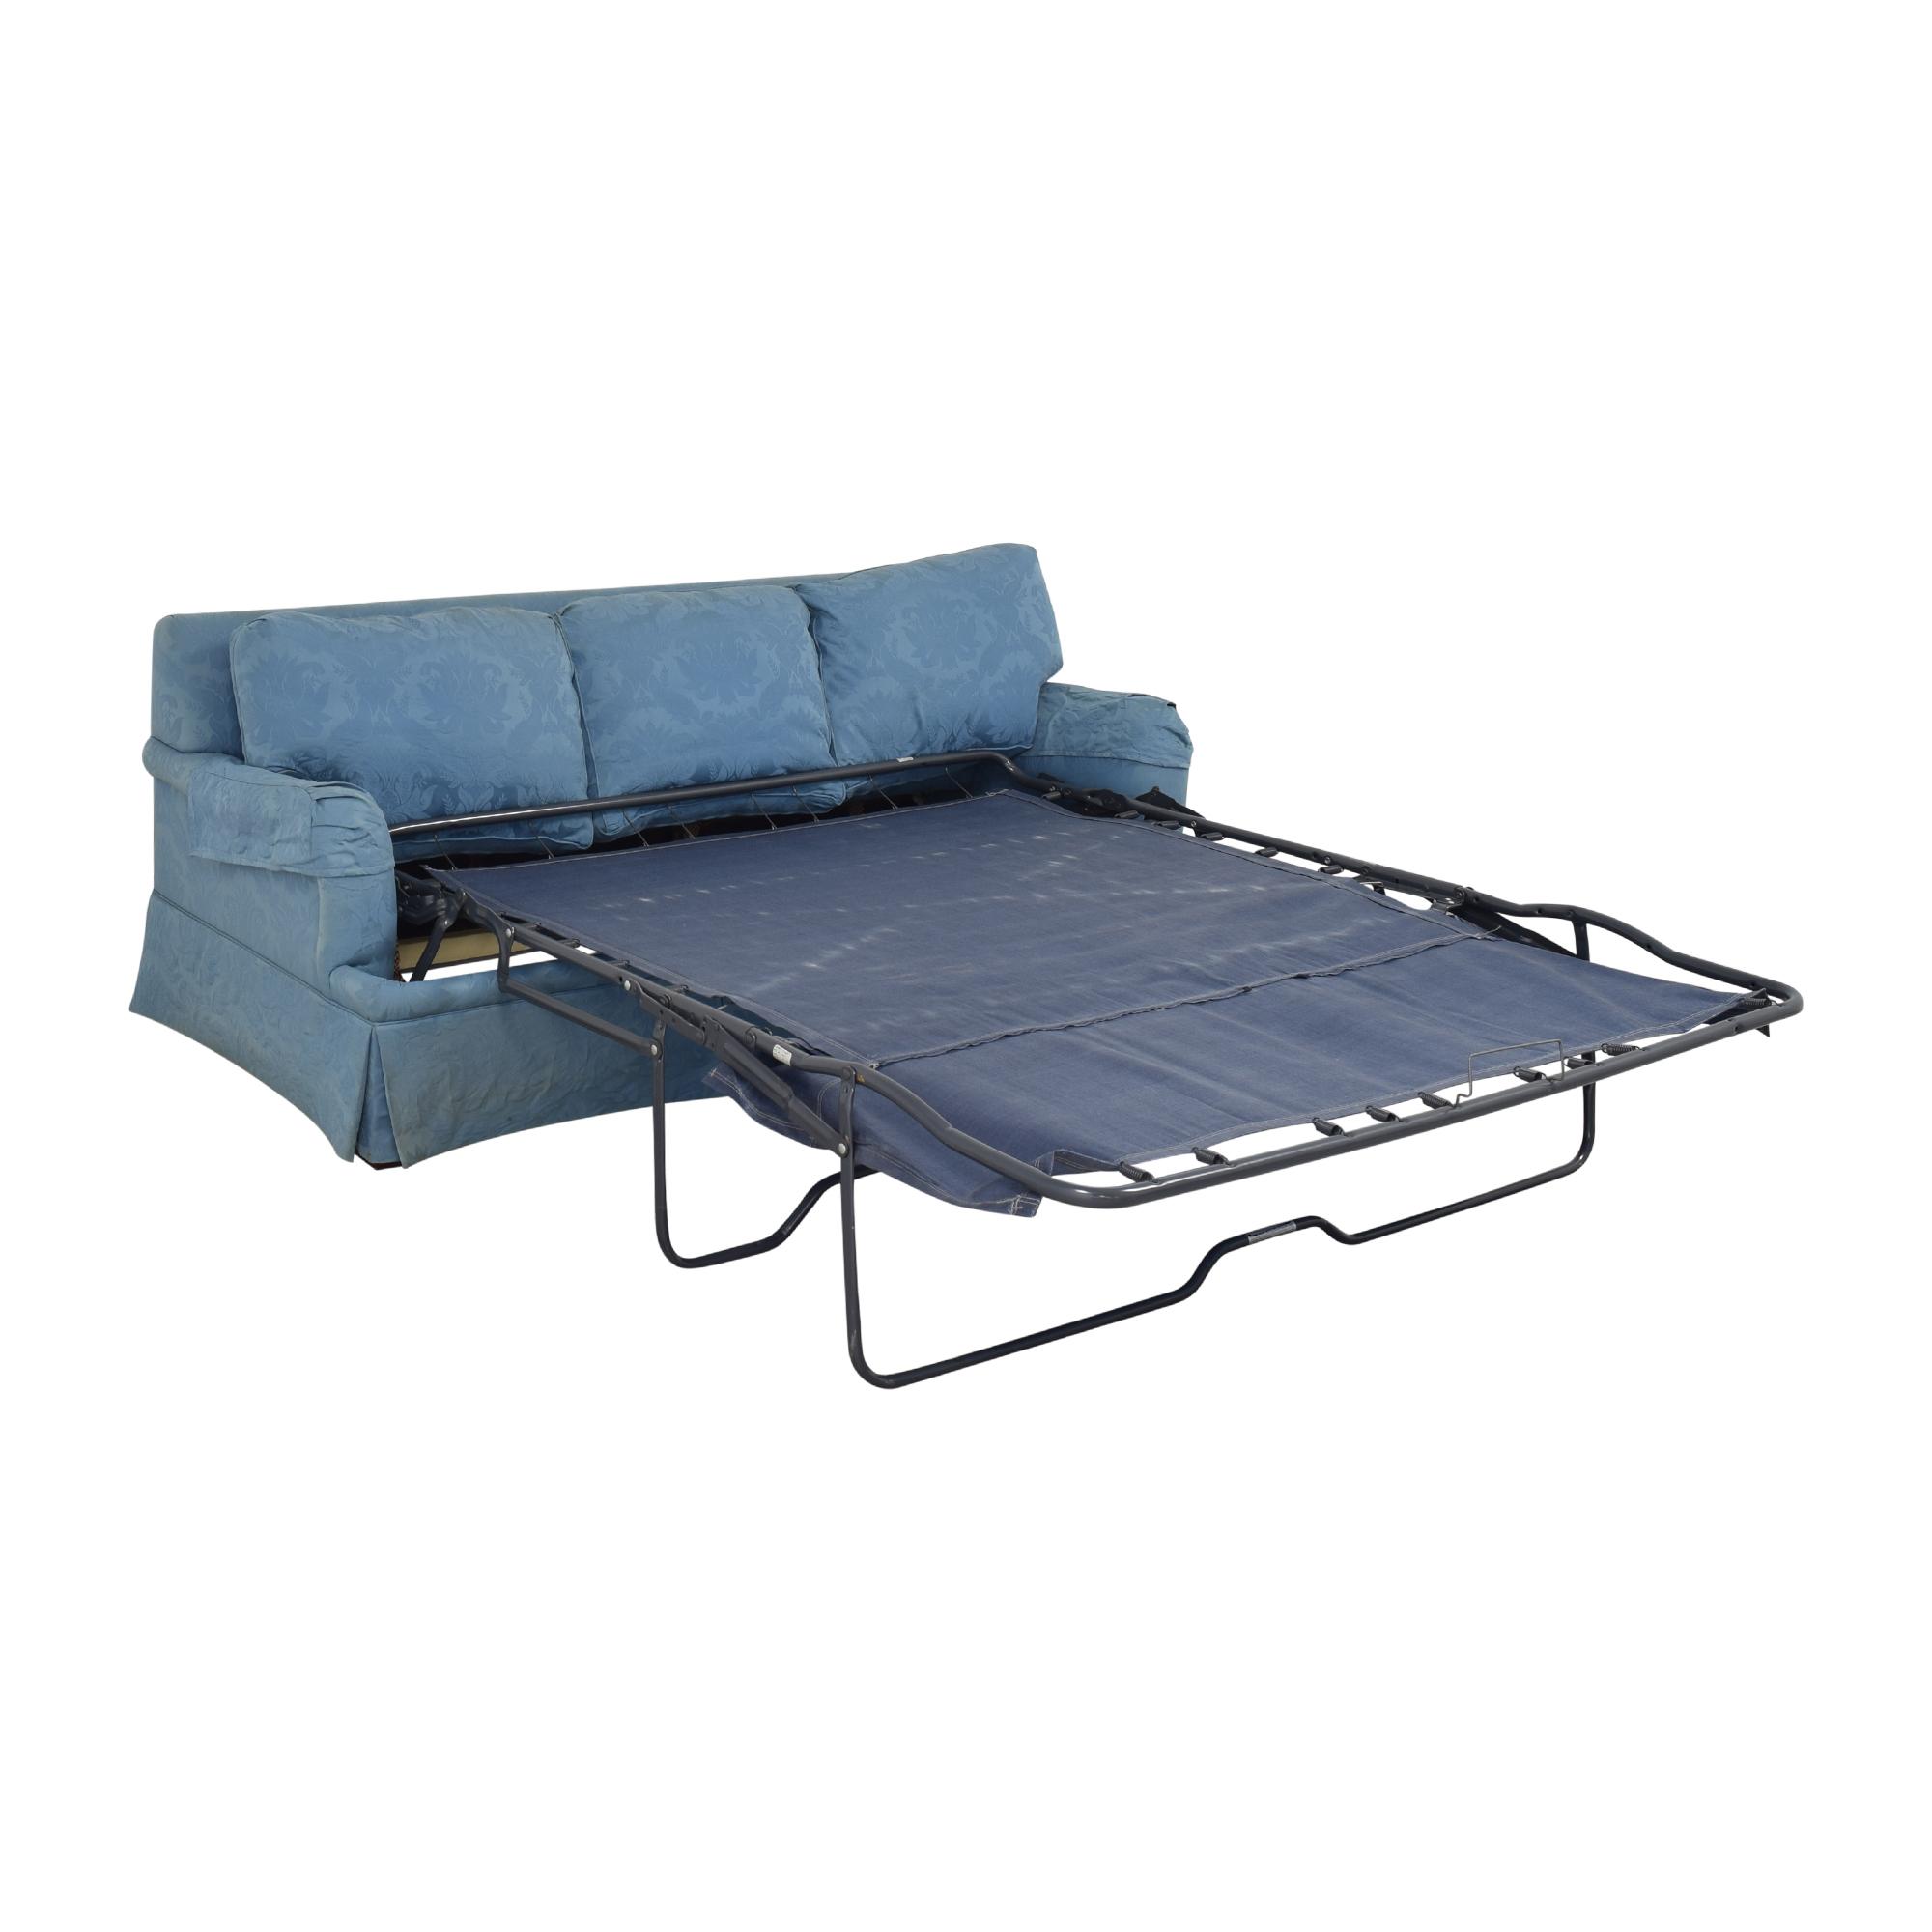 Sherrill Furniture Sherrill Furniture Damask Sleeper Sofa ct